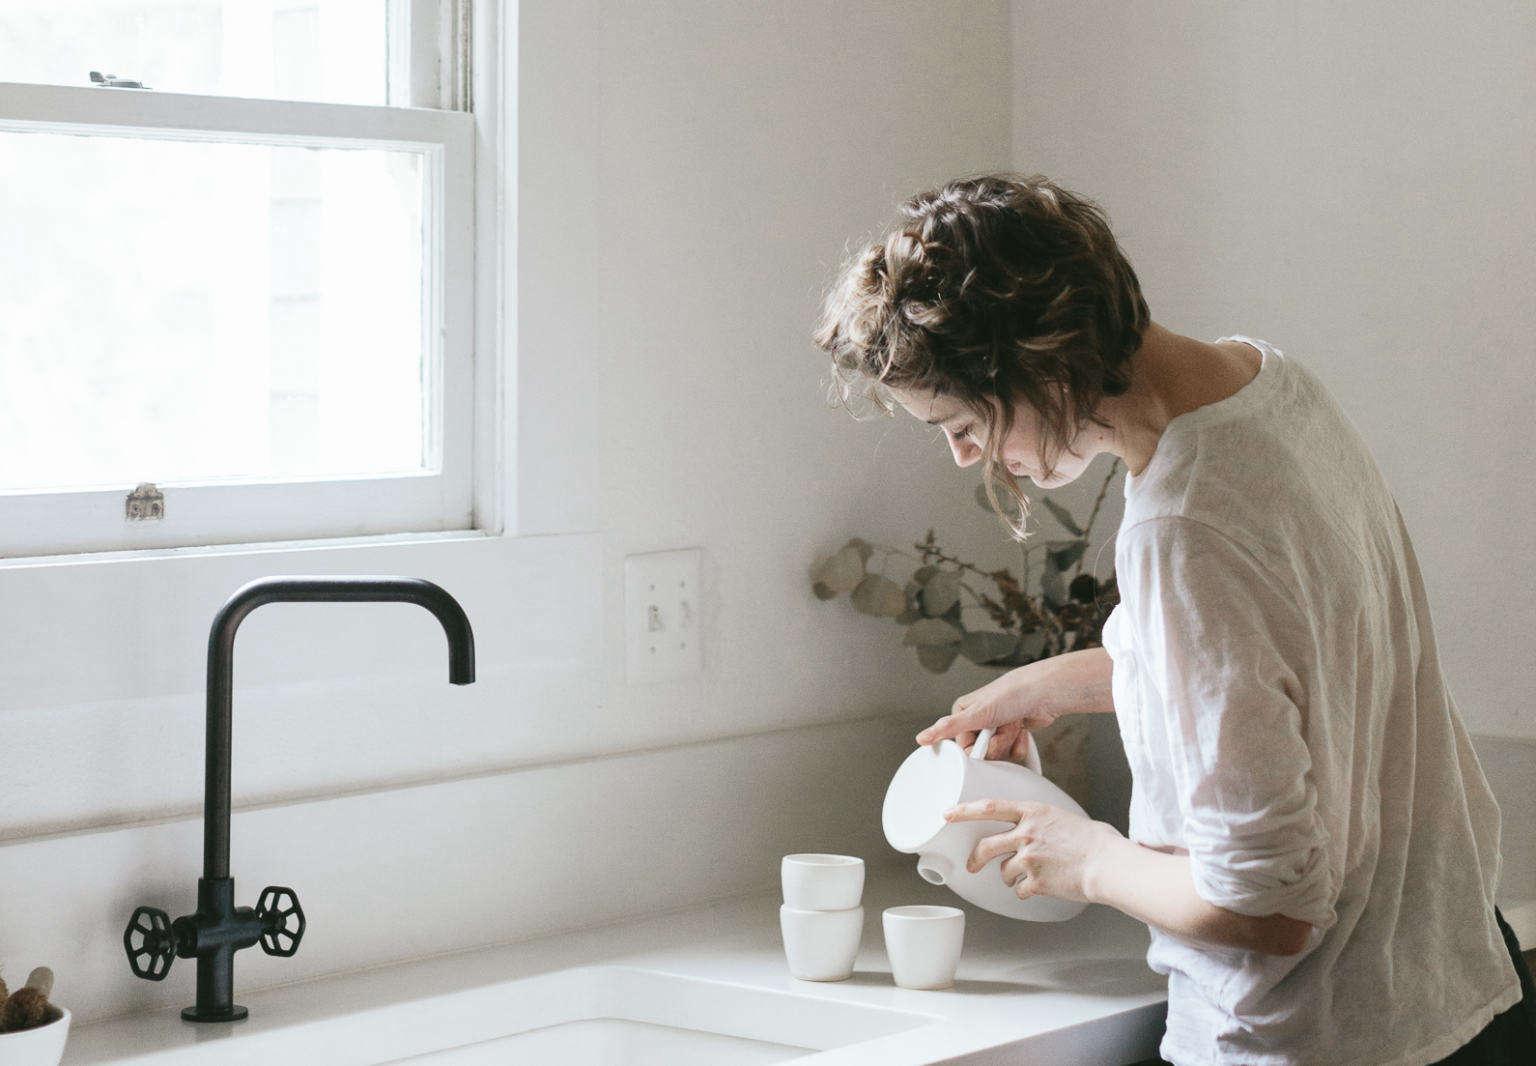 sarah van raden house kitchen portrait kris leboeuf notary ceramics cropped cover image 1536x1066